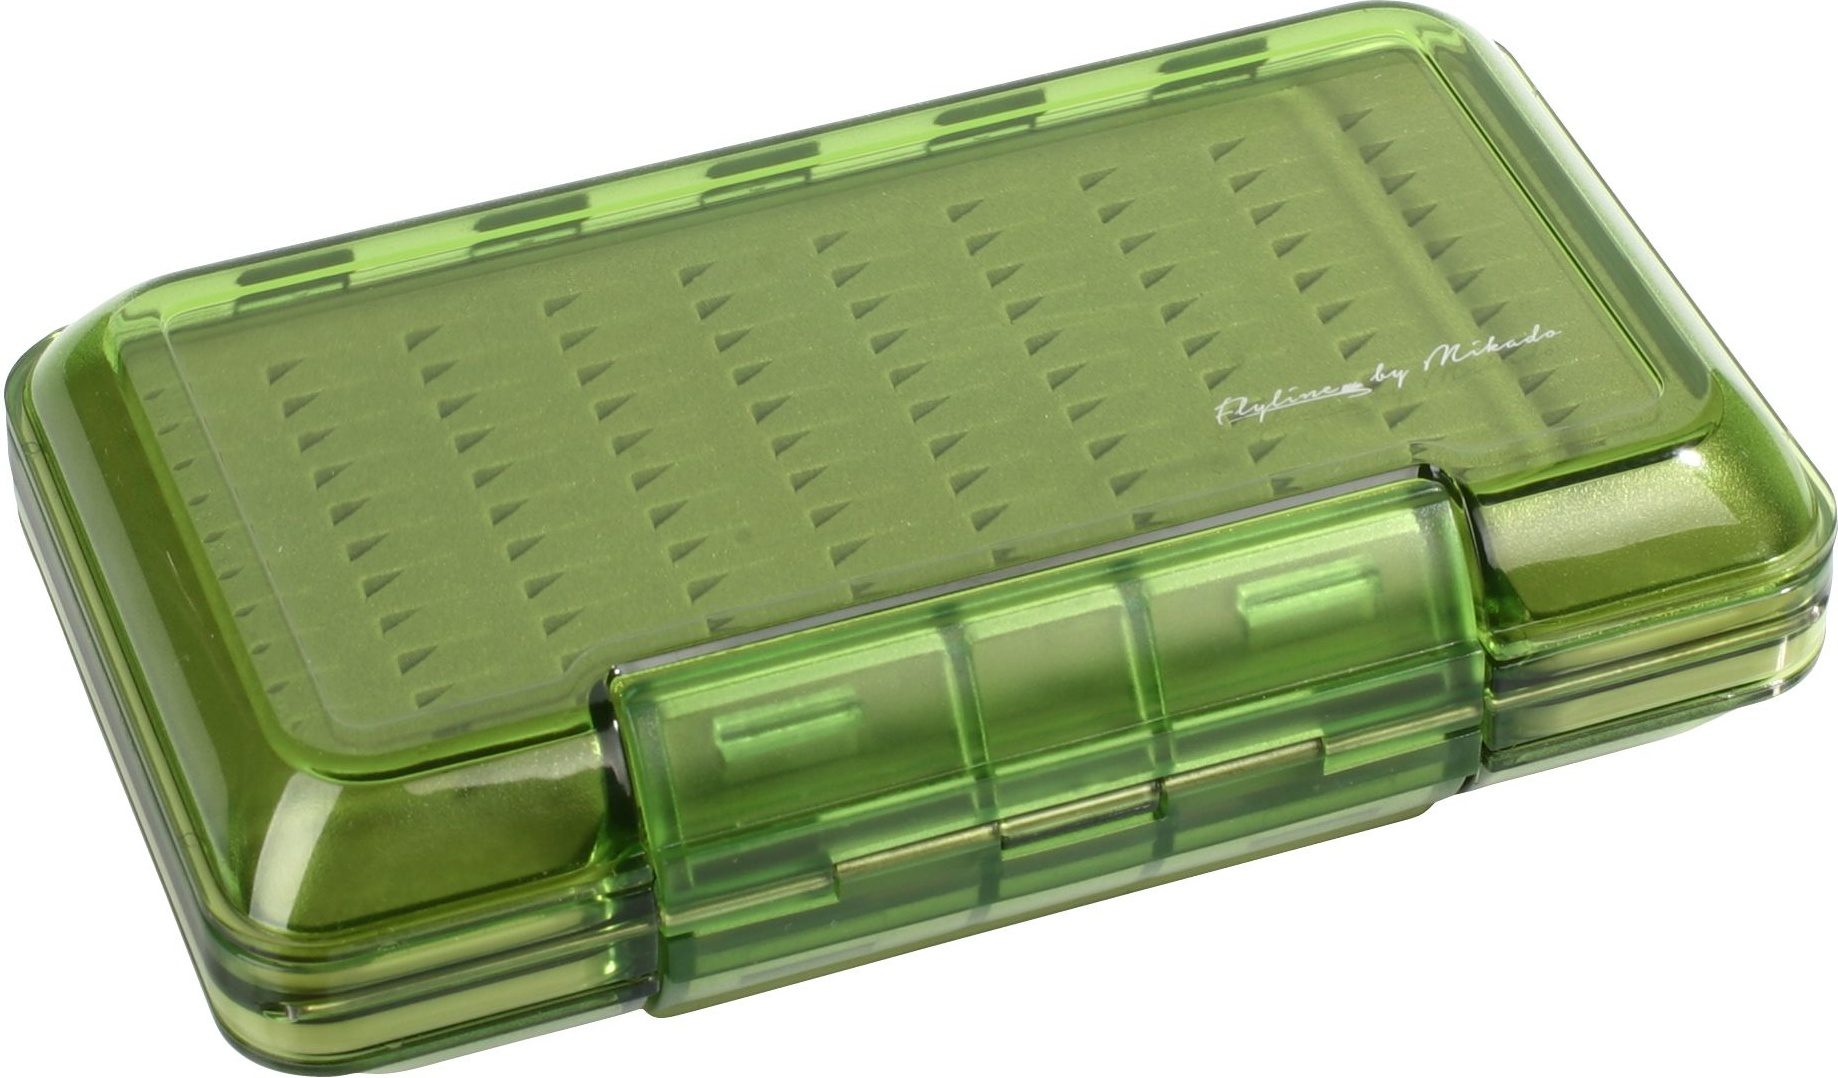 Коробочка для нахлыстовых мушек Mikado UAM-078B (15.8 x 9.8 x 4 см.)